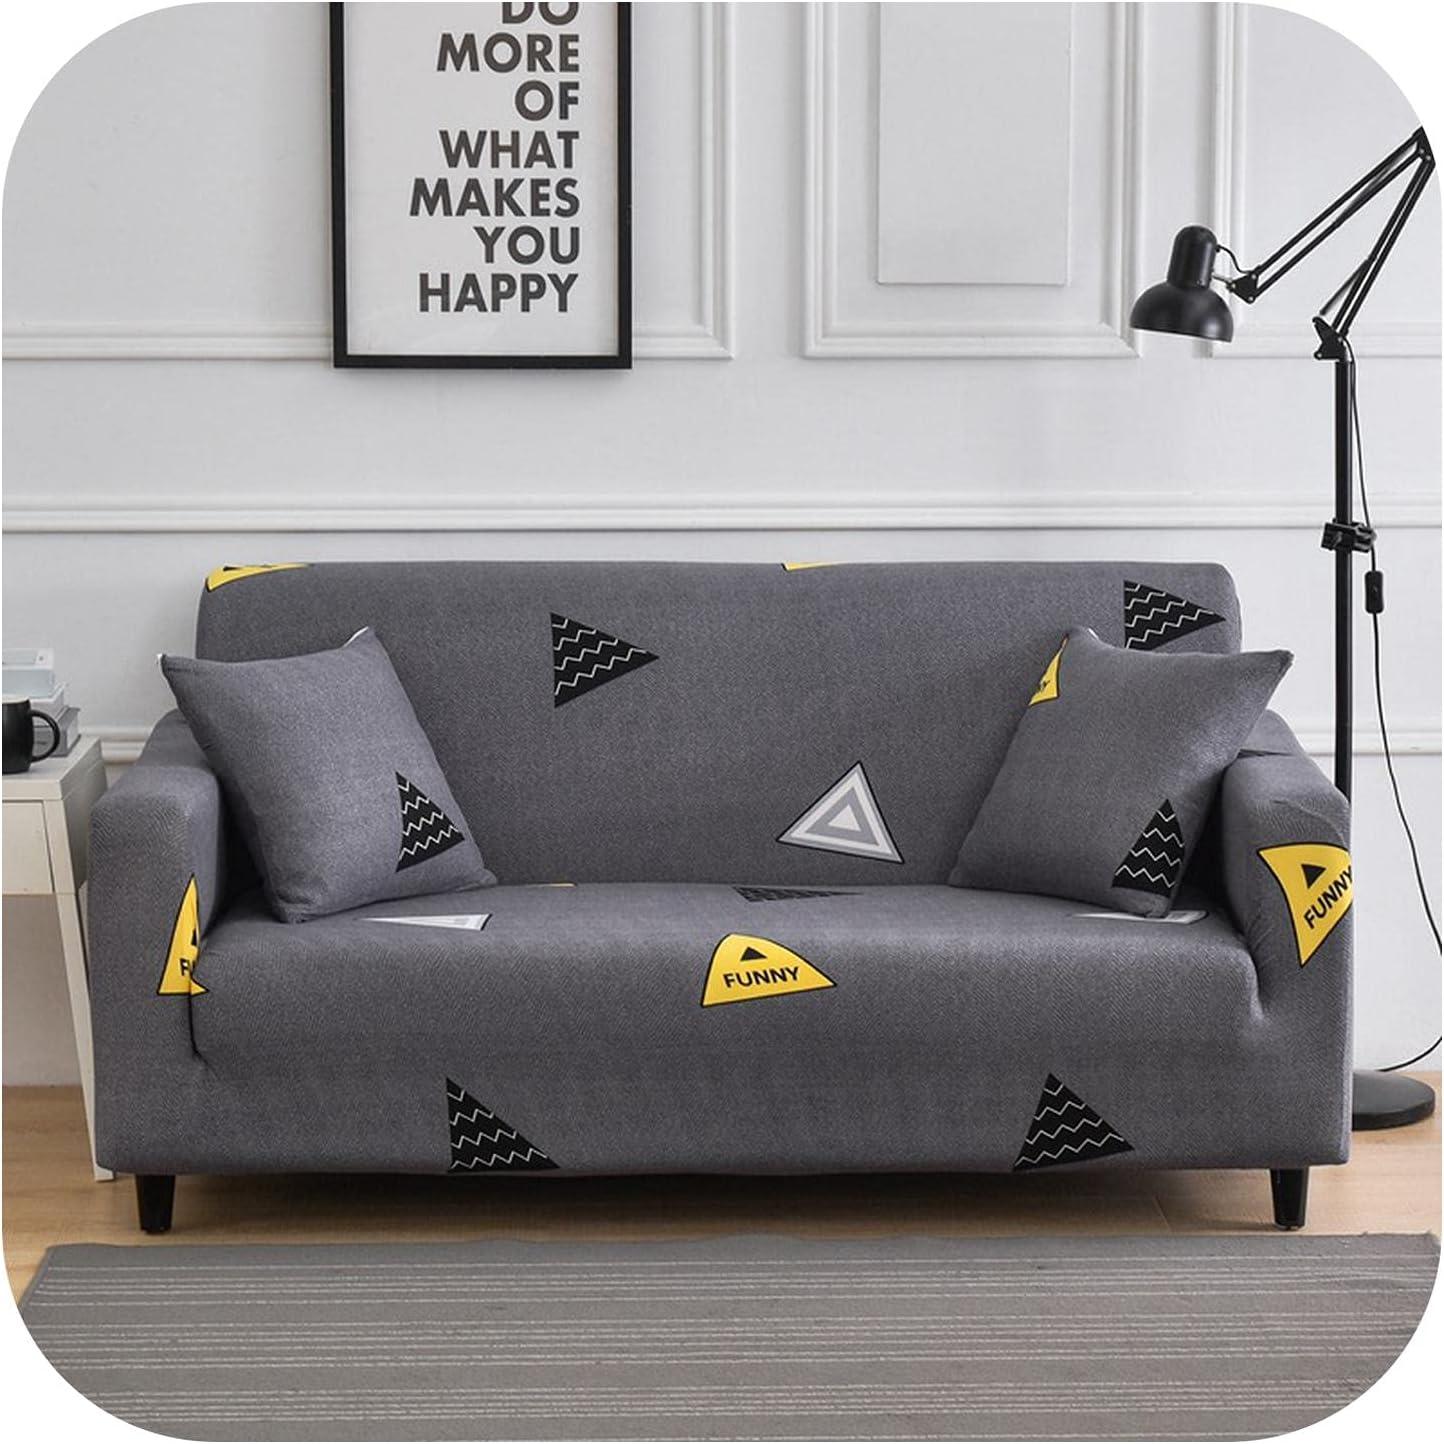 Triumphes 1 2 3 4-Seater All-Inclusive Stretc Max 46% OFF Cover Printed cheap Sofa